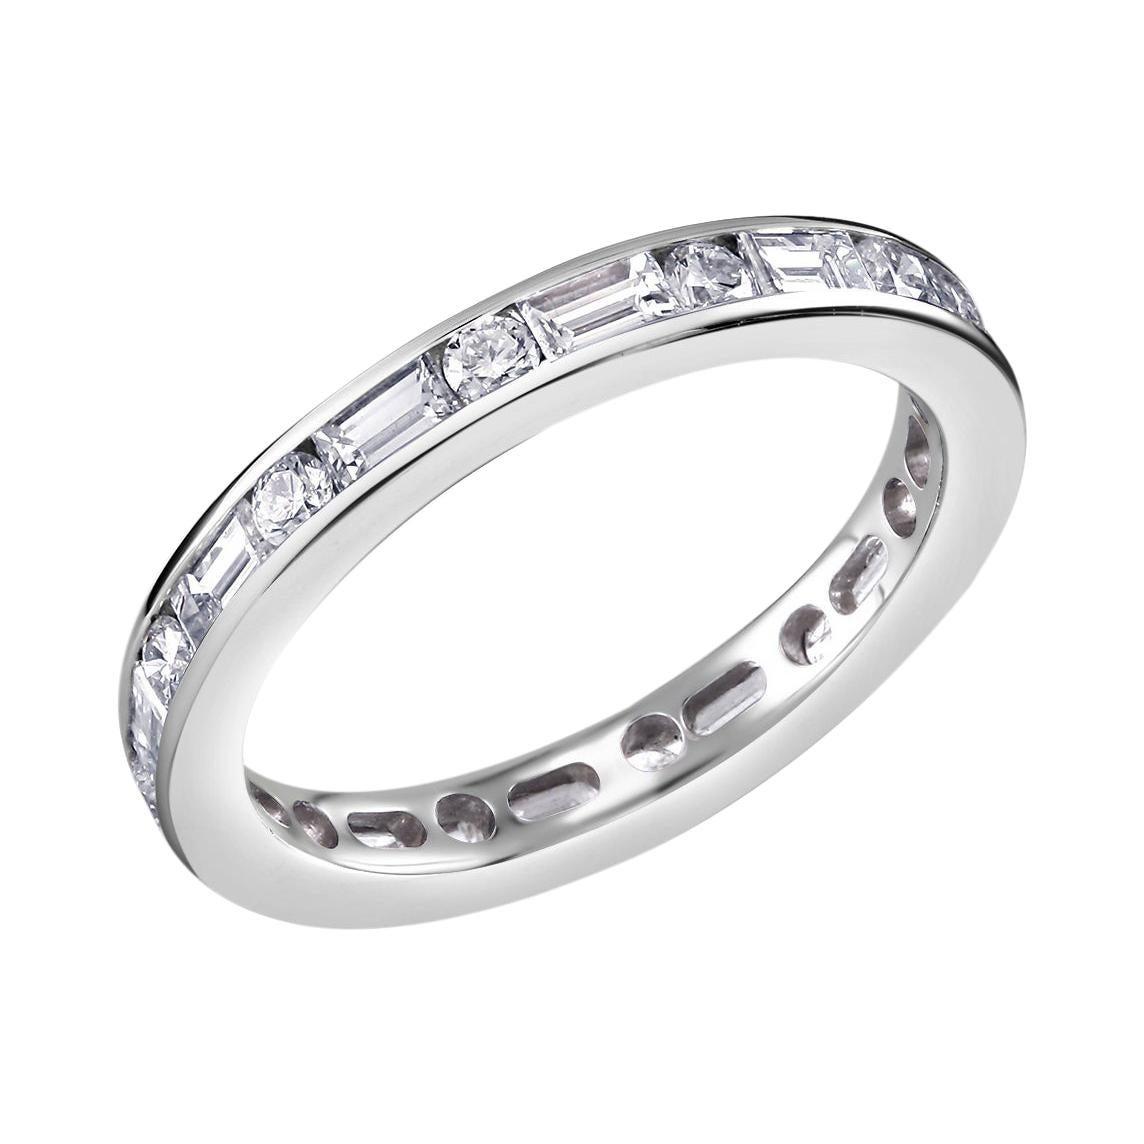 Platinum Baguette Diamond Alternating Round Diamond Eternity Band